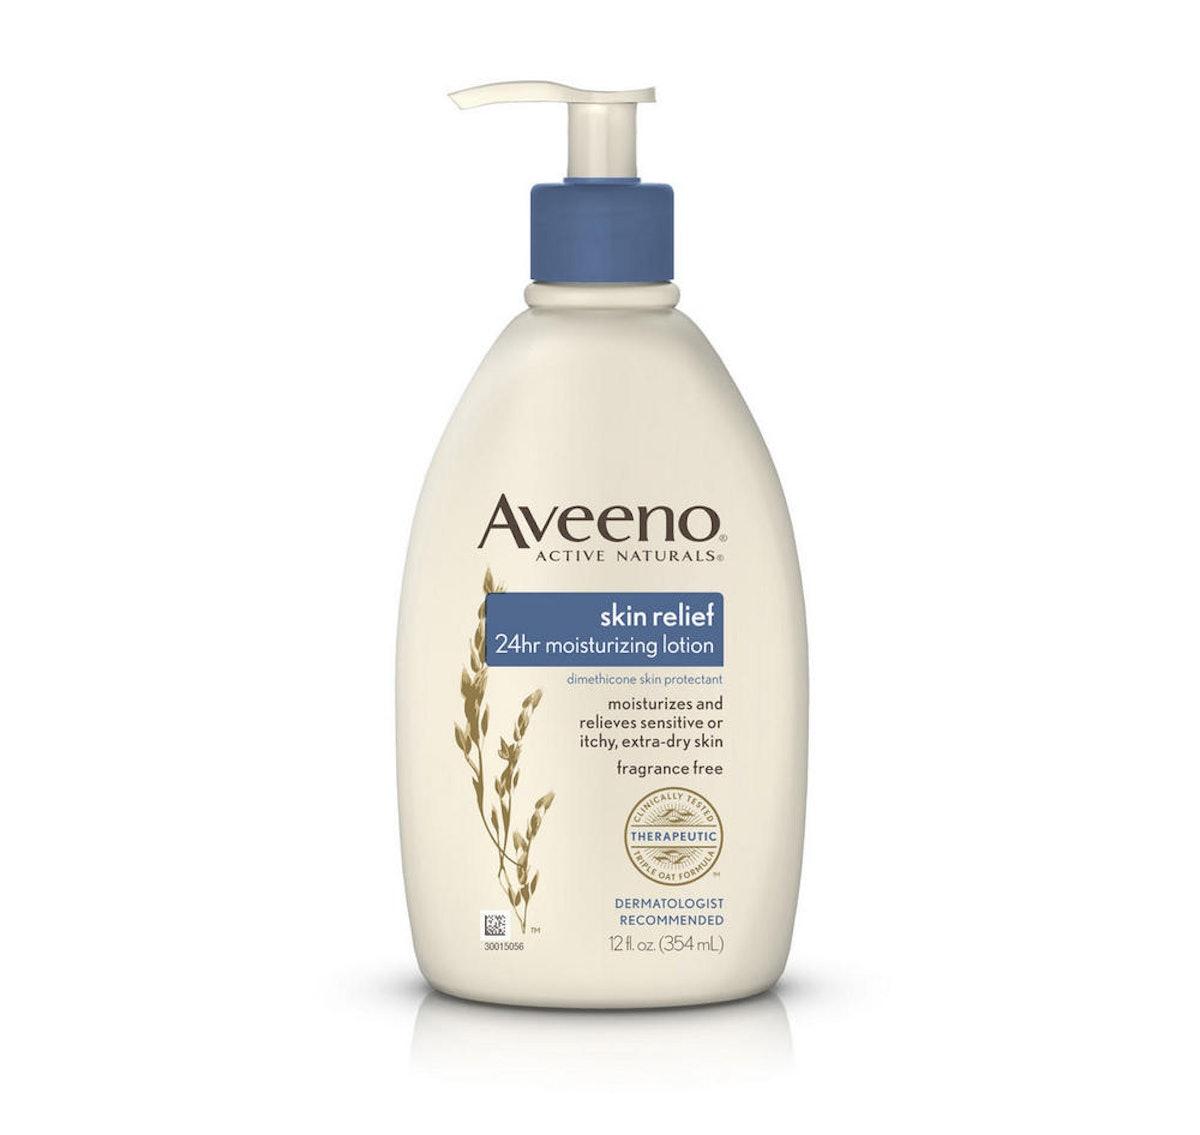 Aveeno Skin Relief 24HR Moisturizing Lotion